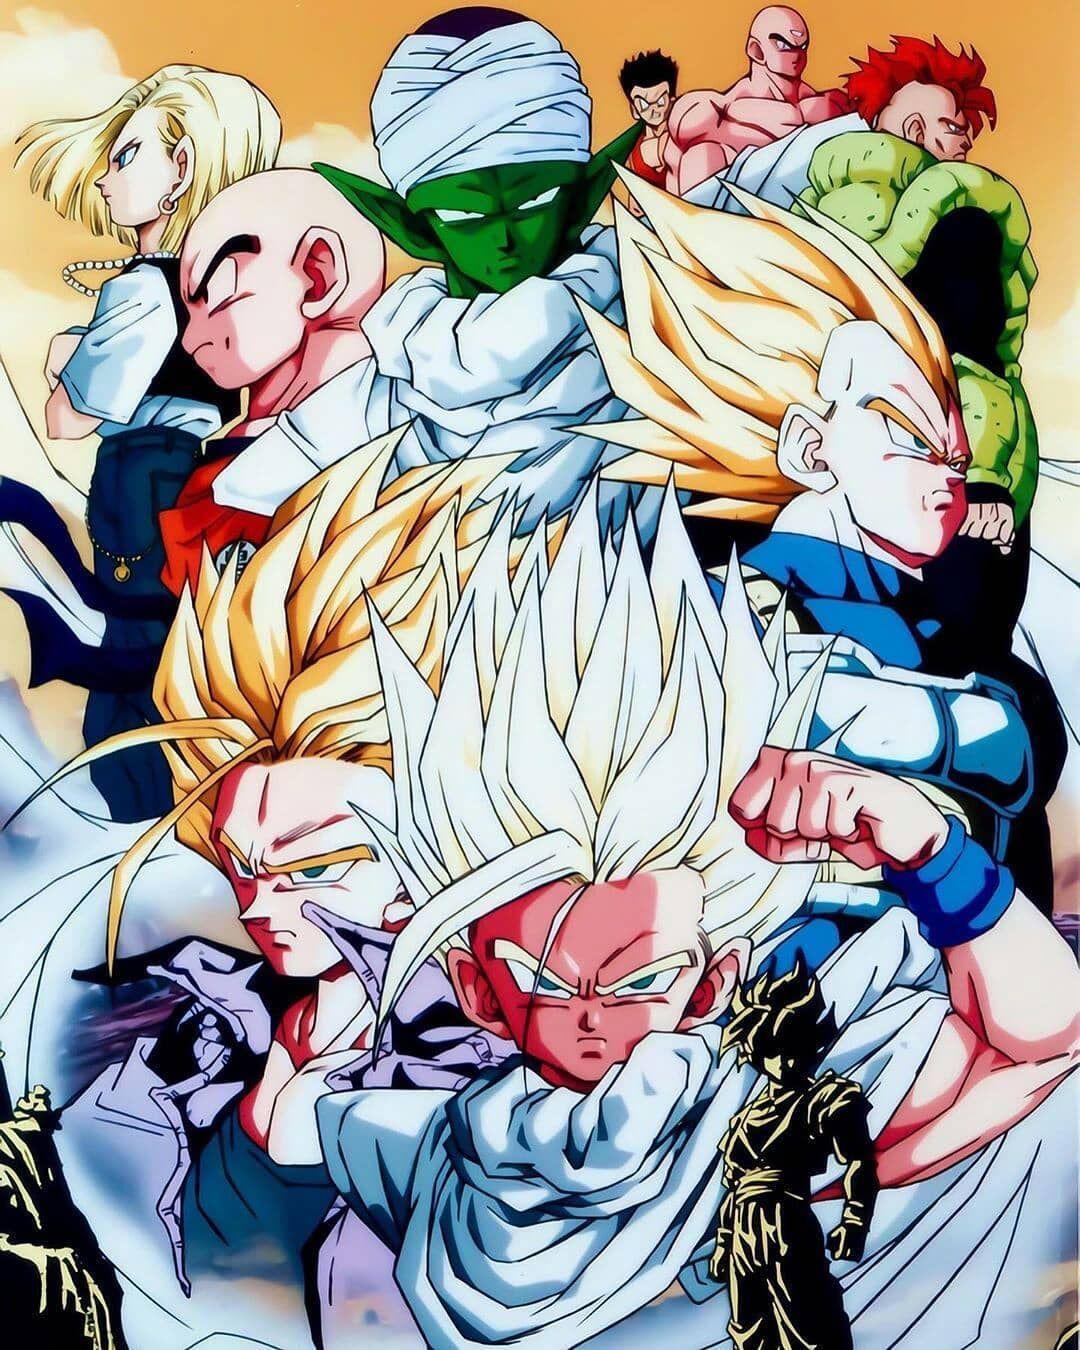 Guerreros Z Dbz Dragonballz Trunks Gohan Vegeta Androide16 Krilin Androide18 Picolo Goku Yamch Dragon Ball Wallpapers Dragon Ball Super Art Dragon Ball Art